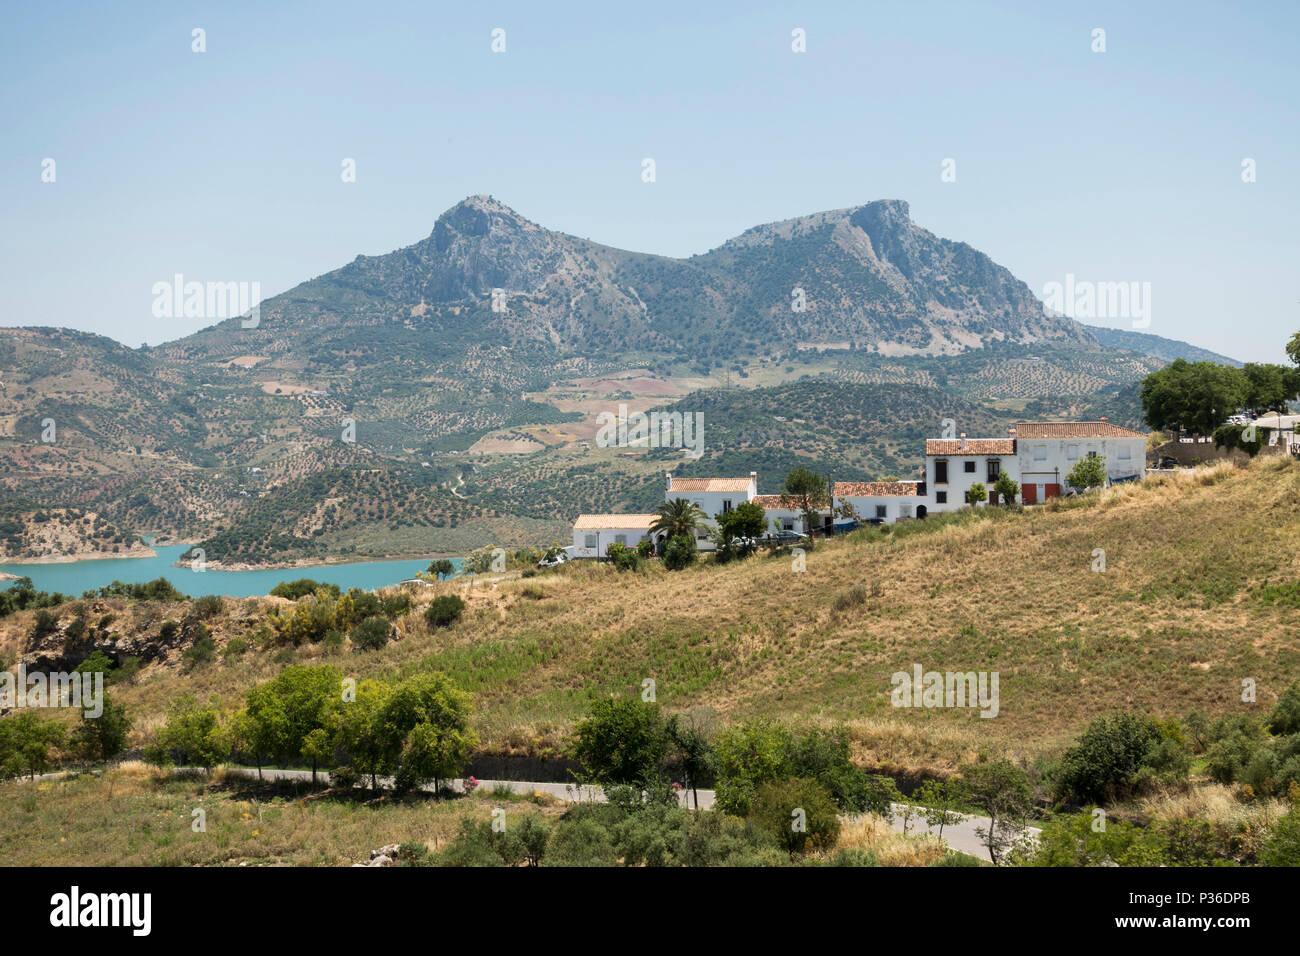 Andalusian village Zahara de la Sierra, with lake, in Sierra de Grazalema Natural Park, Andalucia, Spain - Stock Image